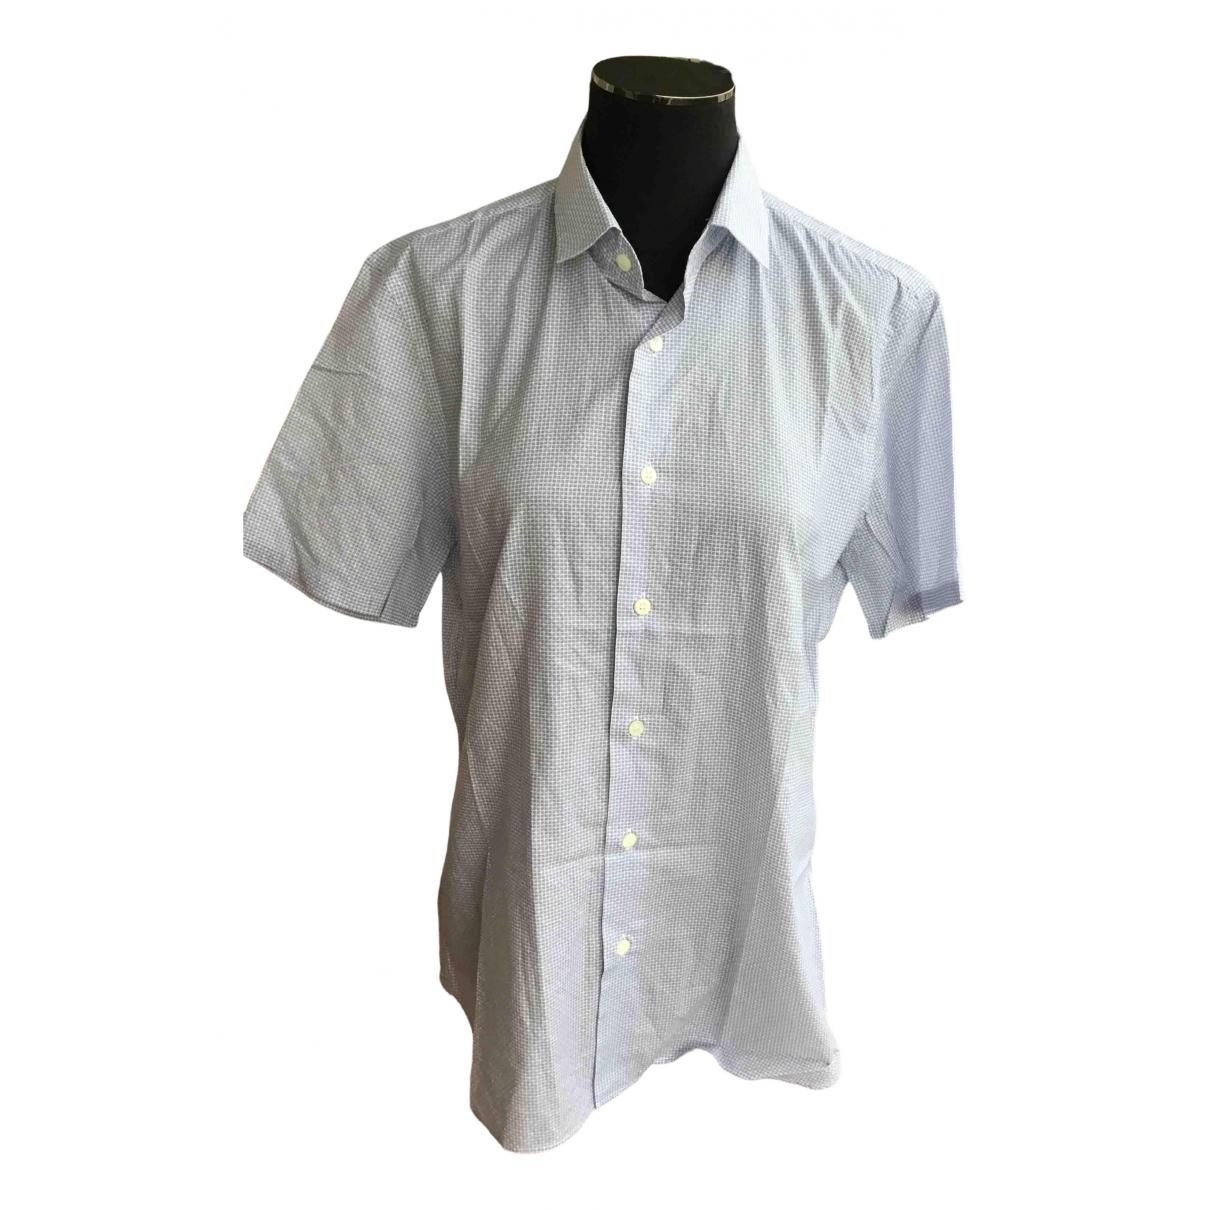 Prada \N Blue Cotton Shirts for Men 15.5 UK - US (tour de cou / collar)